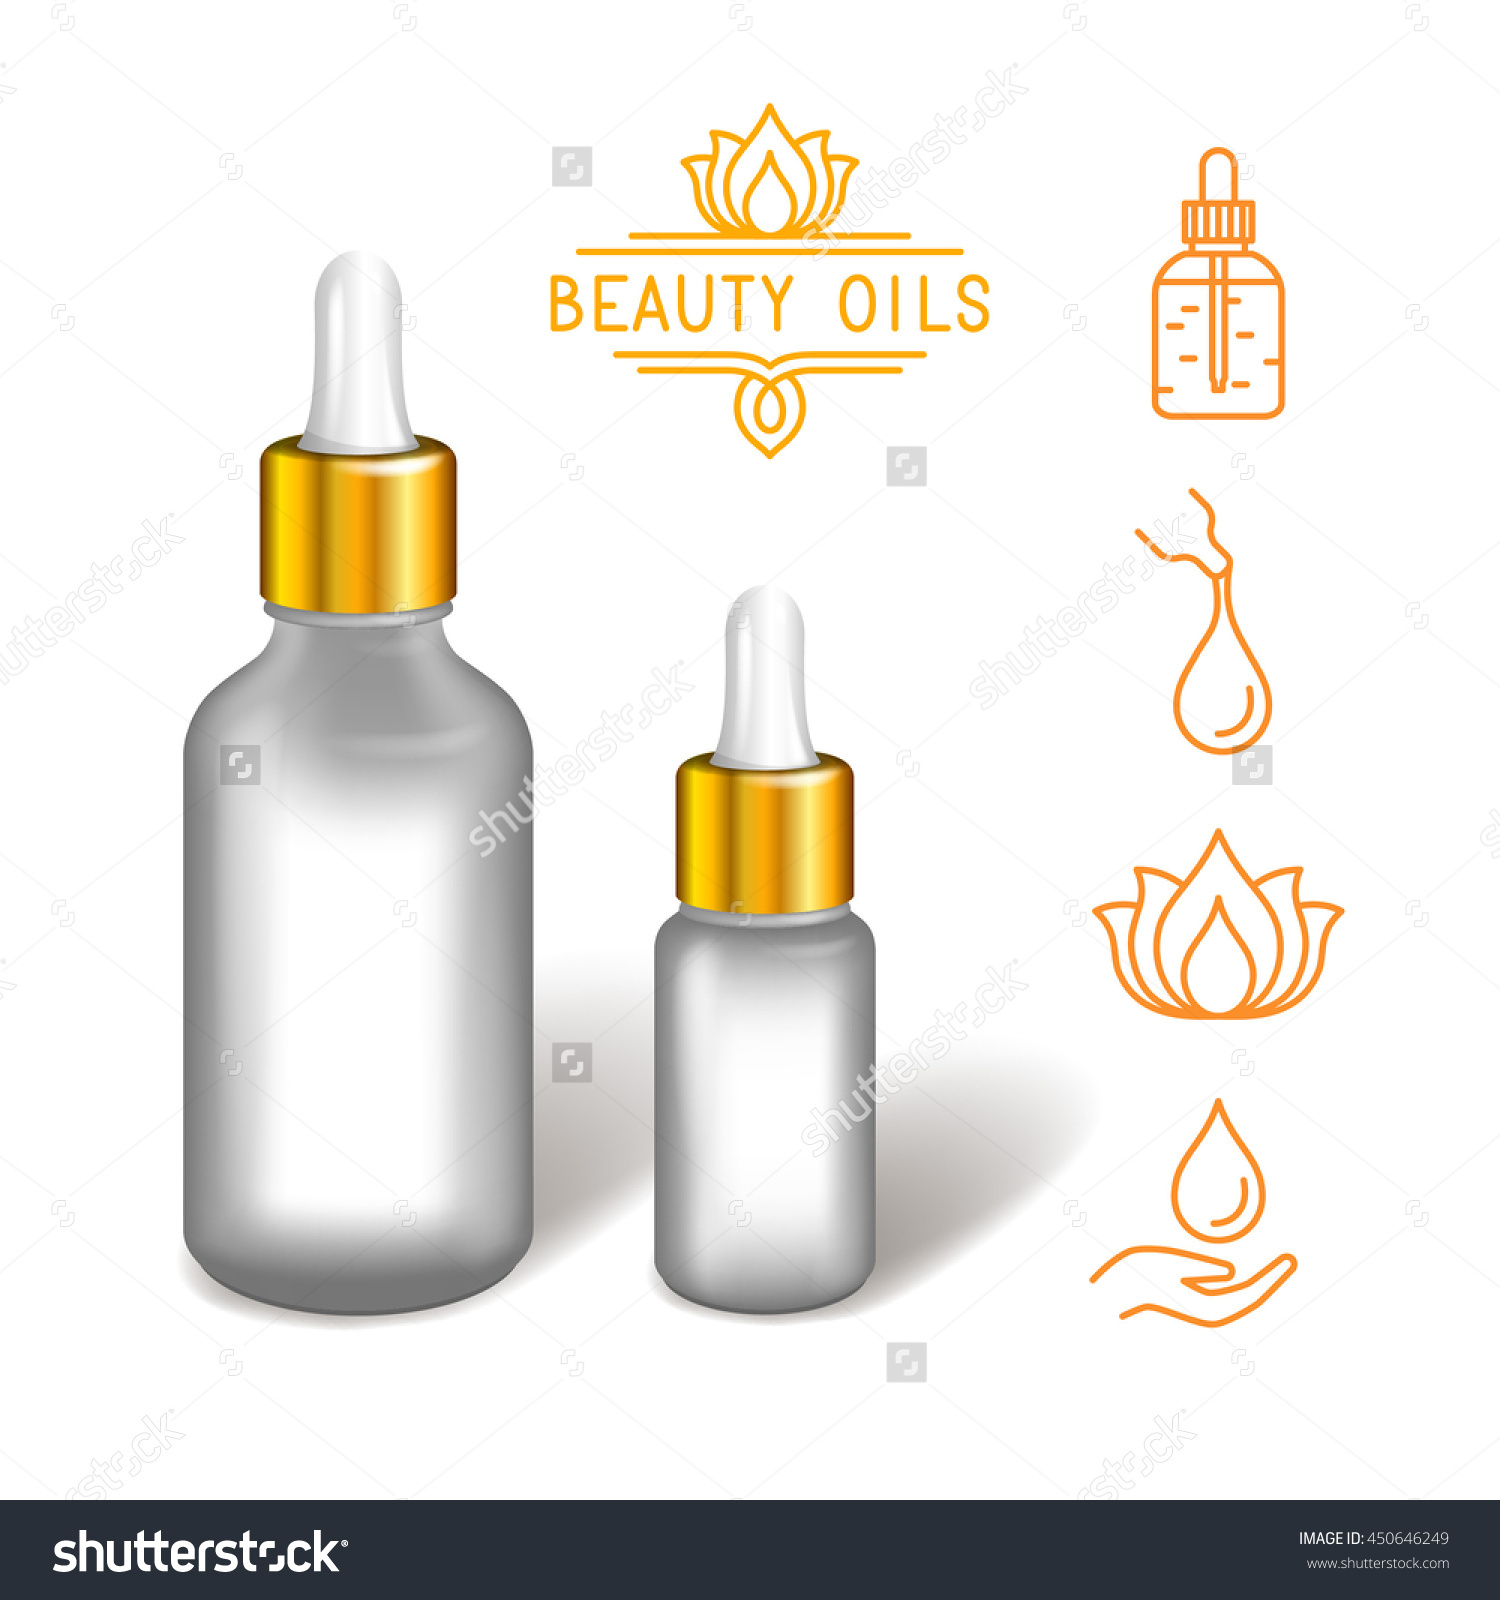 Oil Gel Lotion Serum Elixir Bottle Stock Vector 450646249.